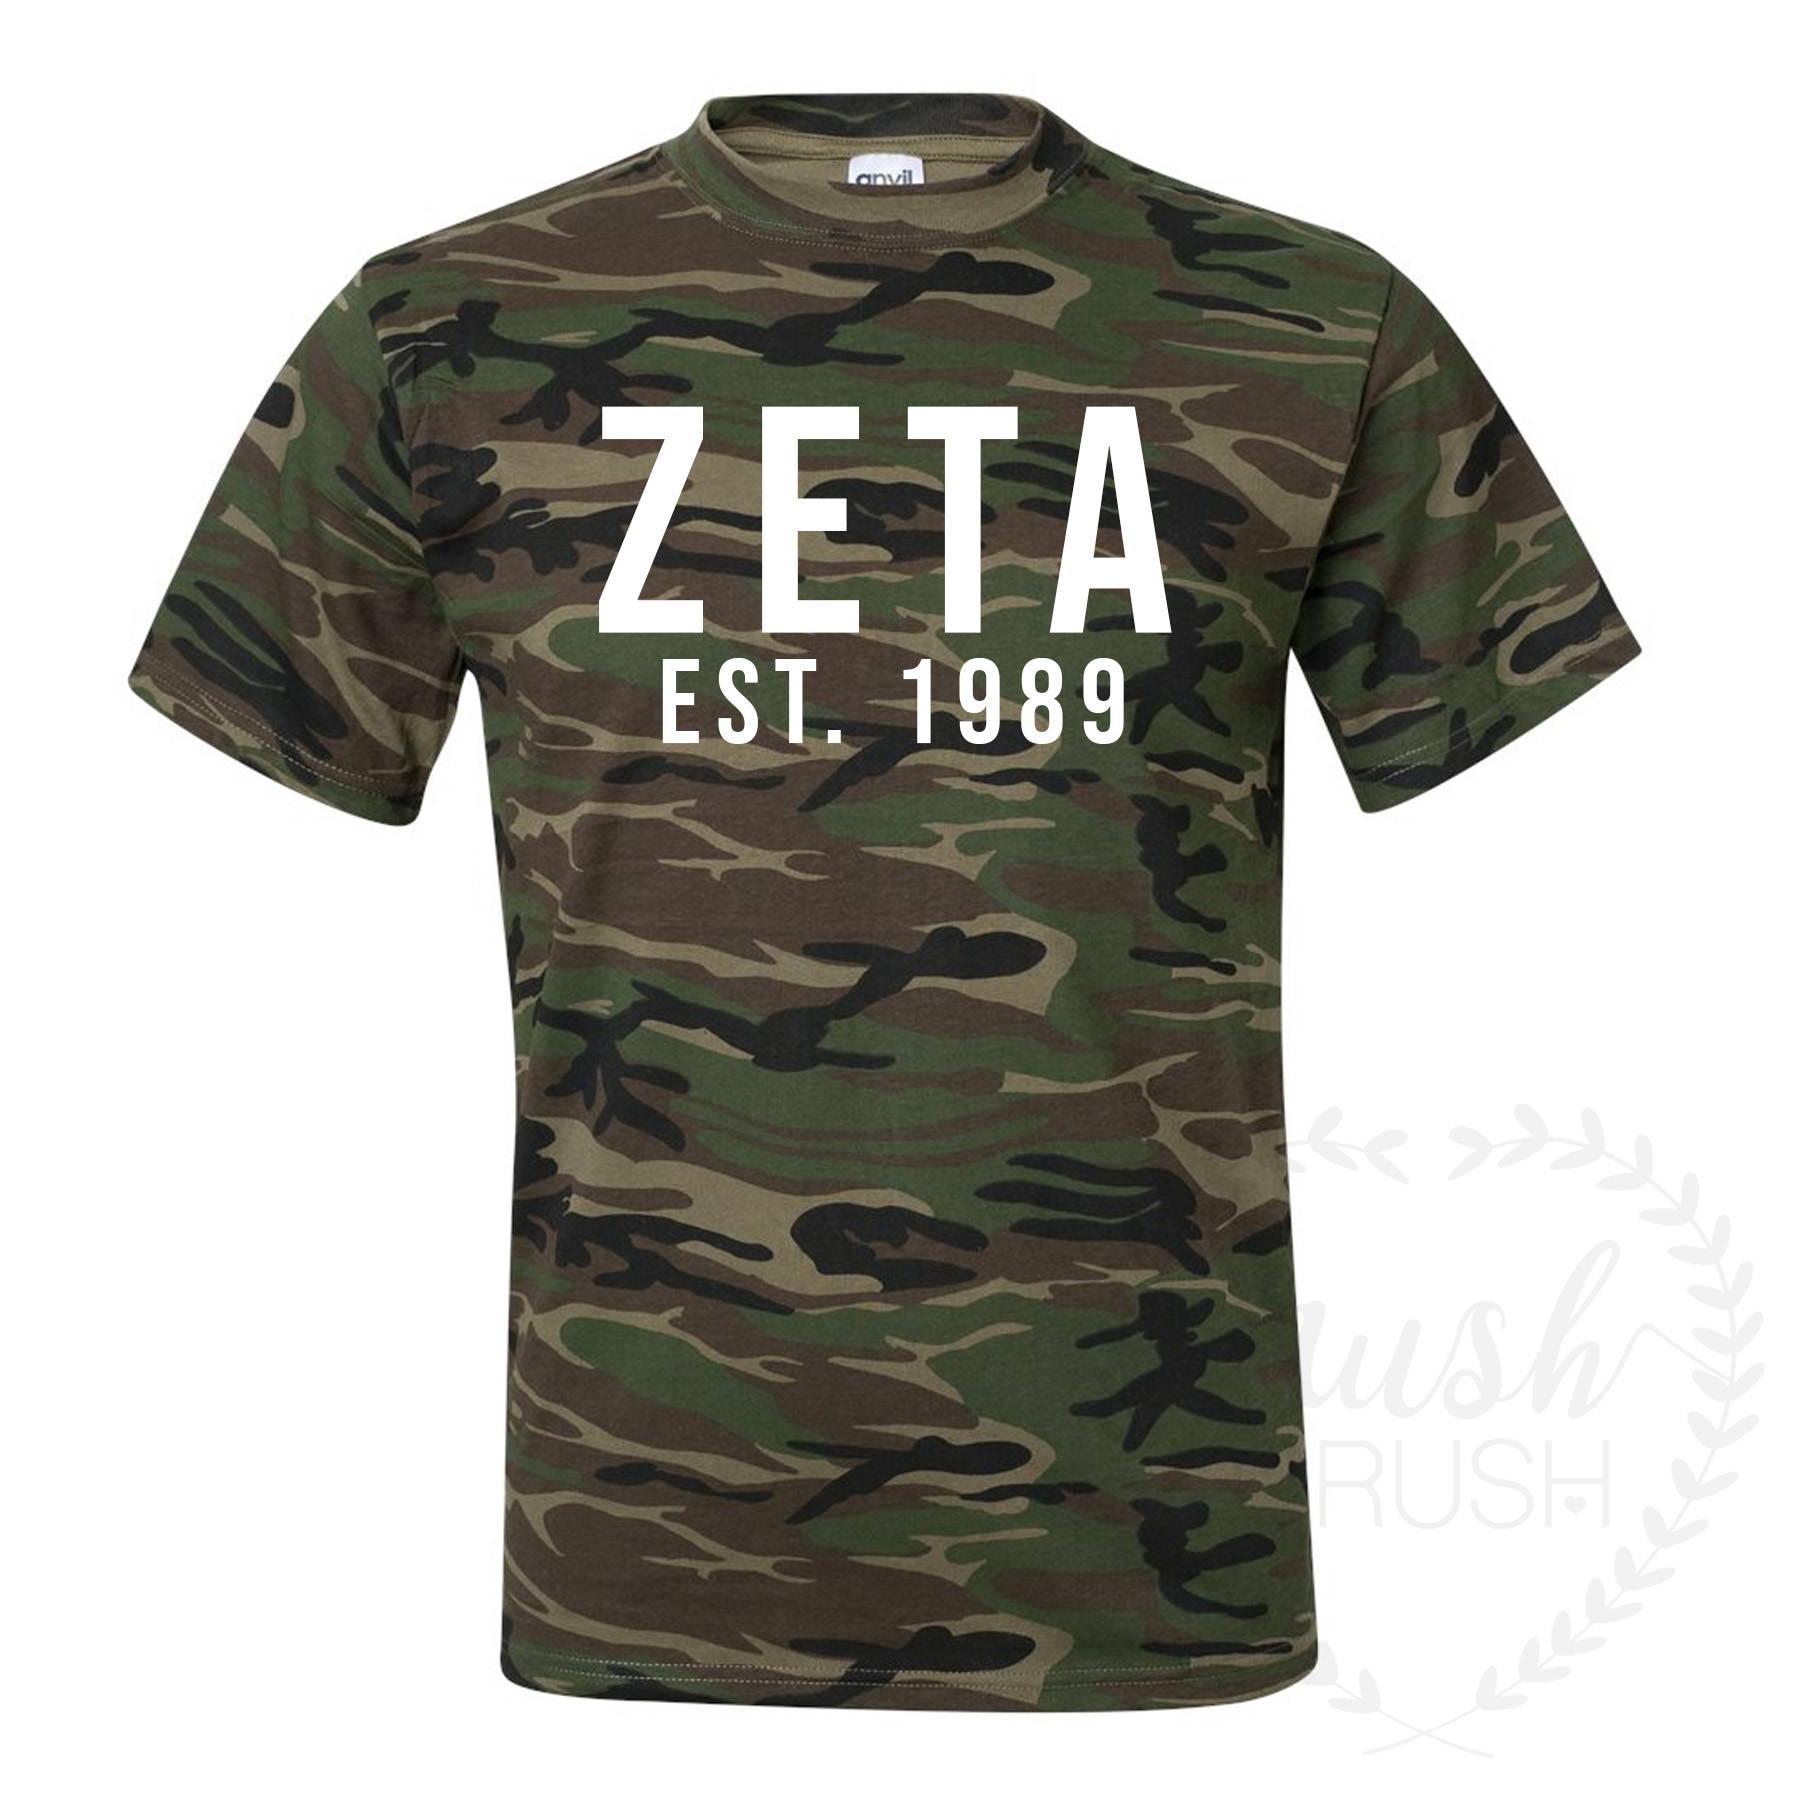 Zeta Camo Shirt